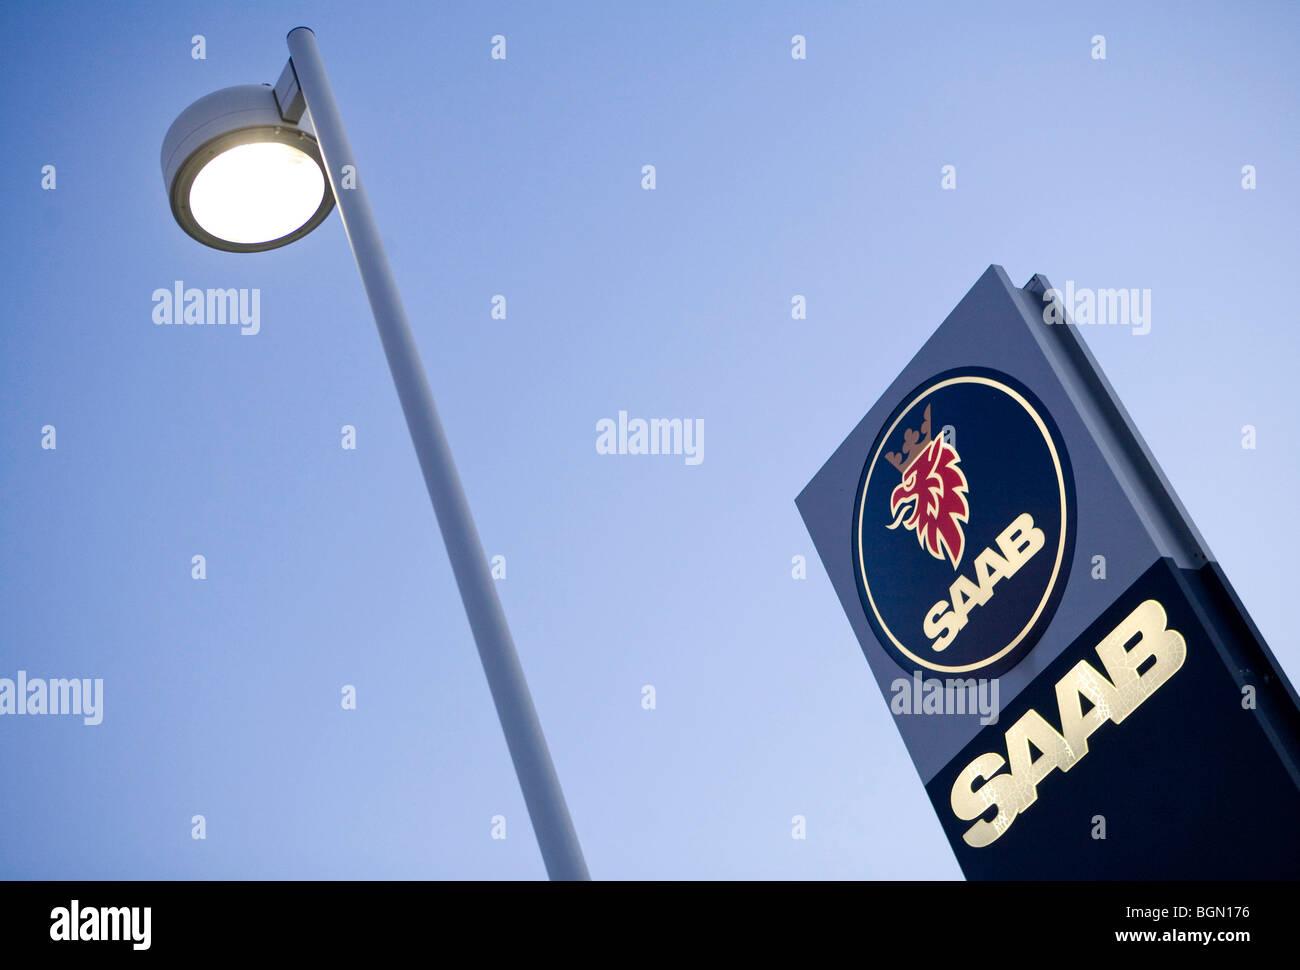 A Saab dealer lot.  - Stock Image